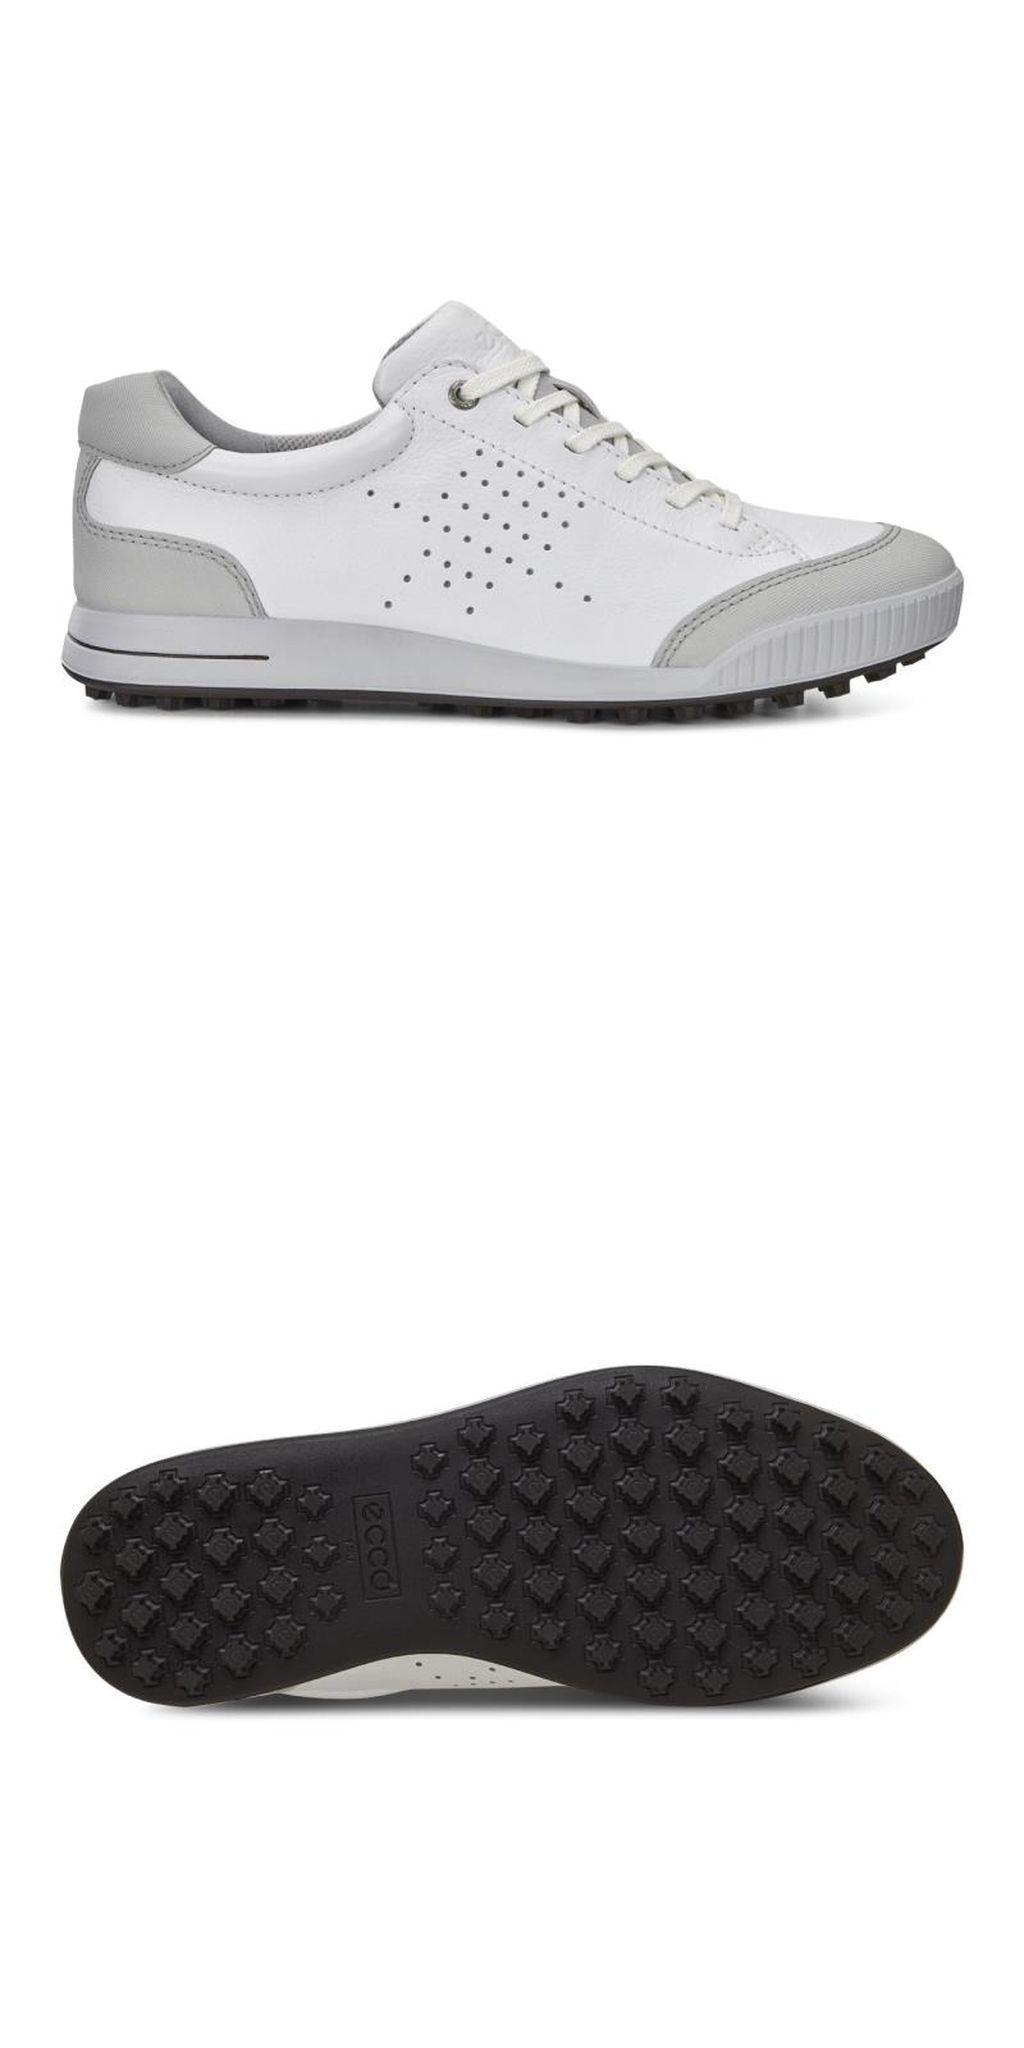 Other Golf Clothing 158939: New Men S Ecco Golf Street Retro 150604 54322  White Concrete